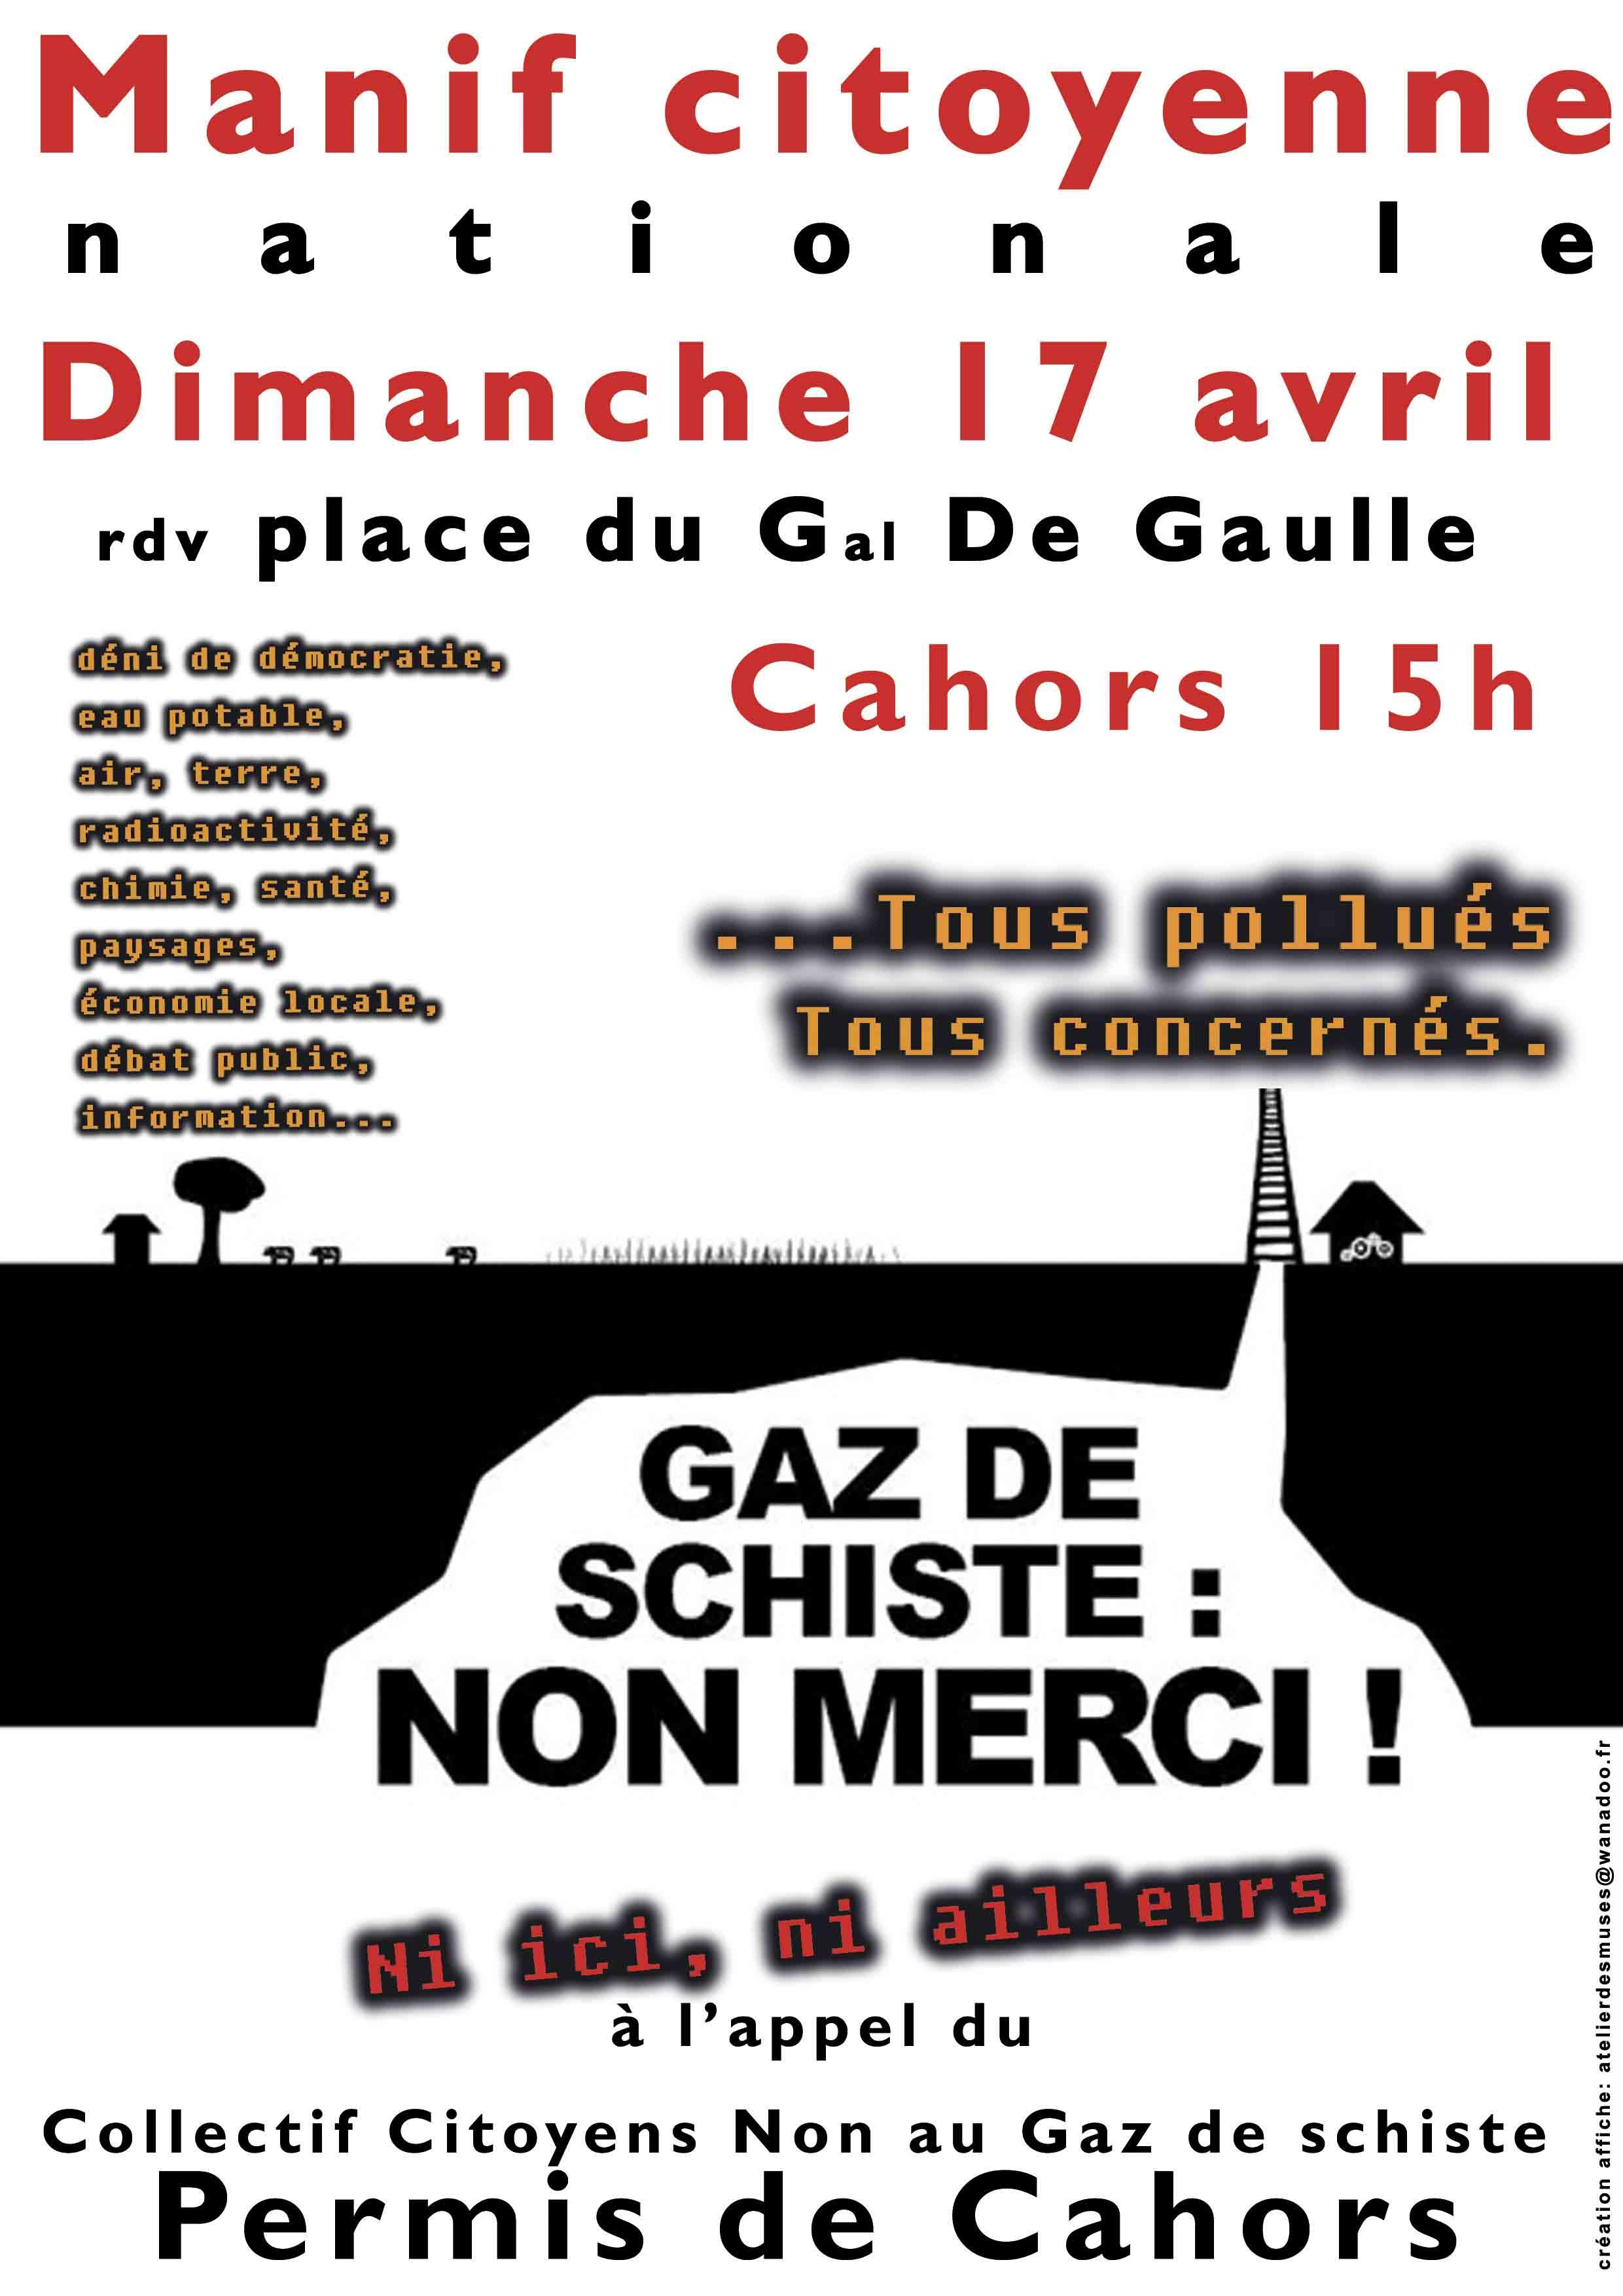 2011_04_17_affiche_manif_cahors.jpg